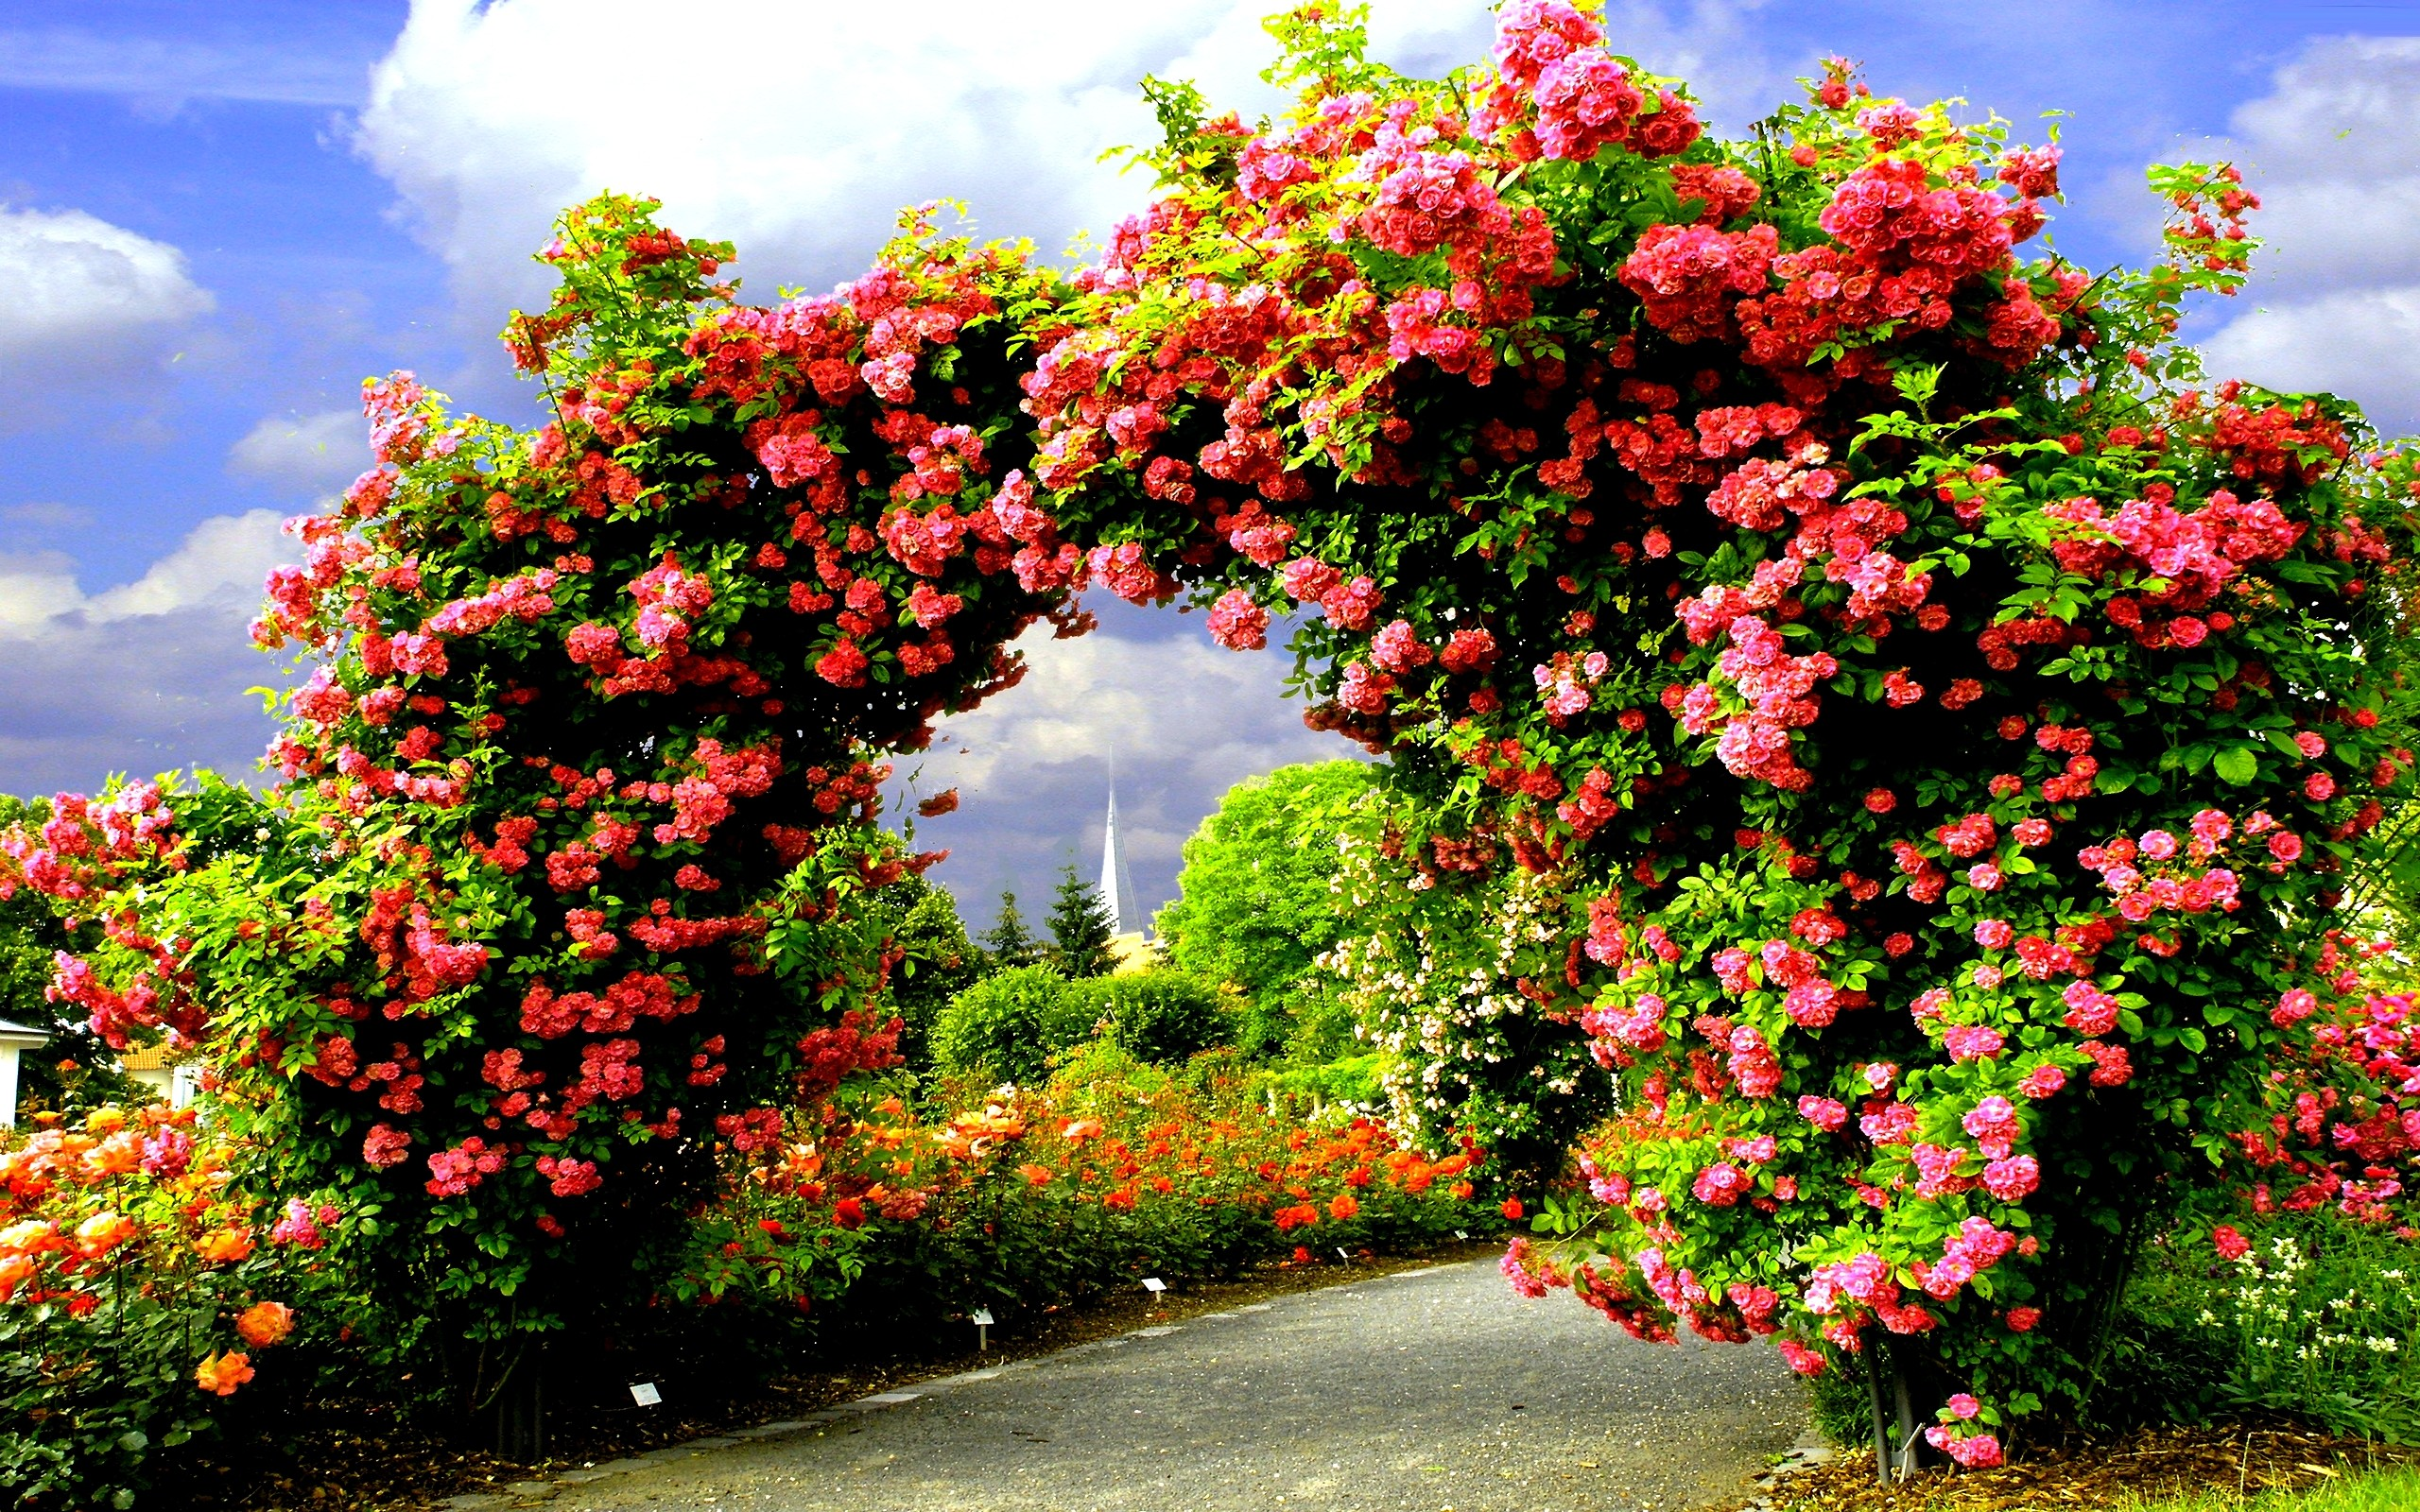 Garden Wallpapers HD 2560x1600